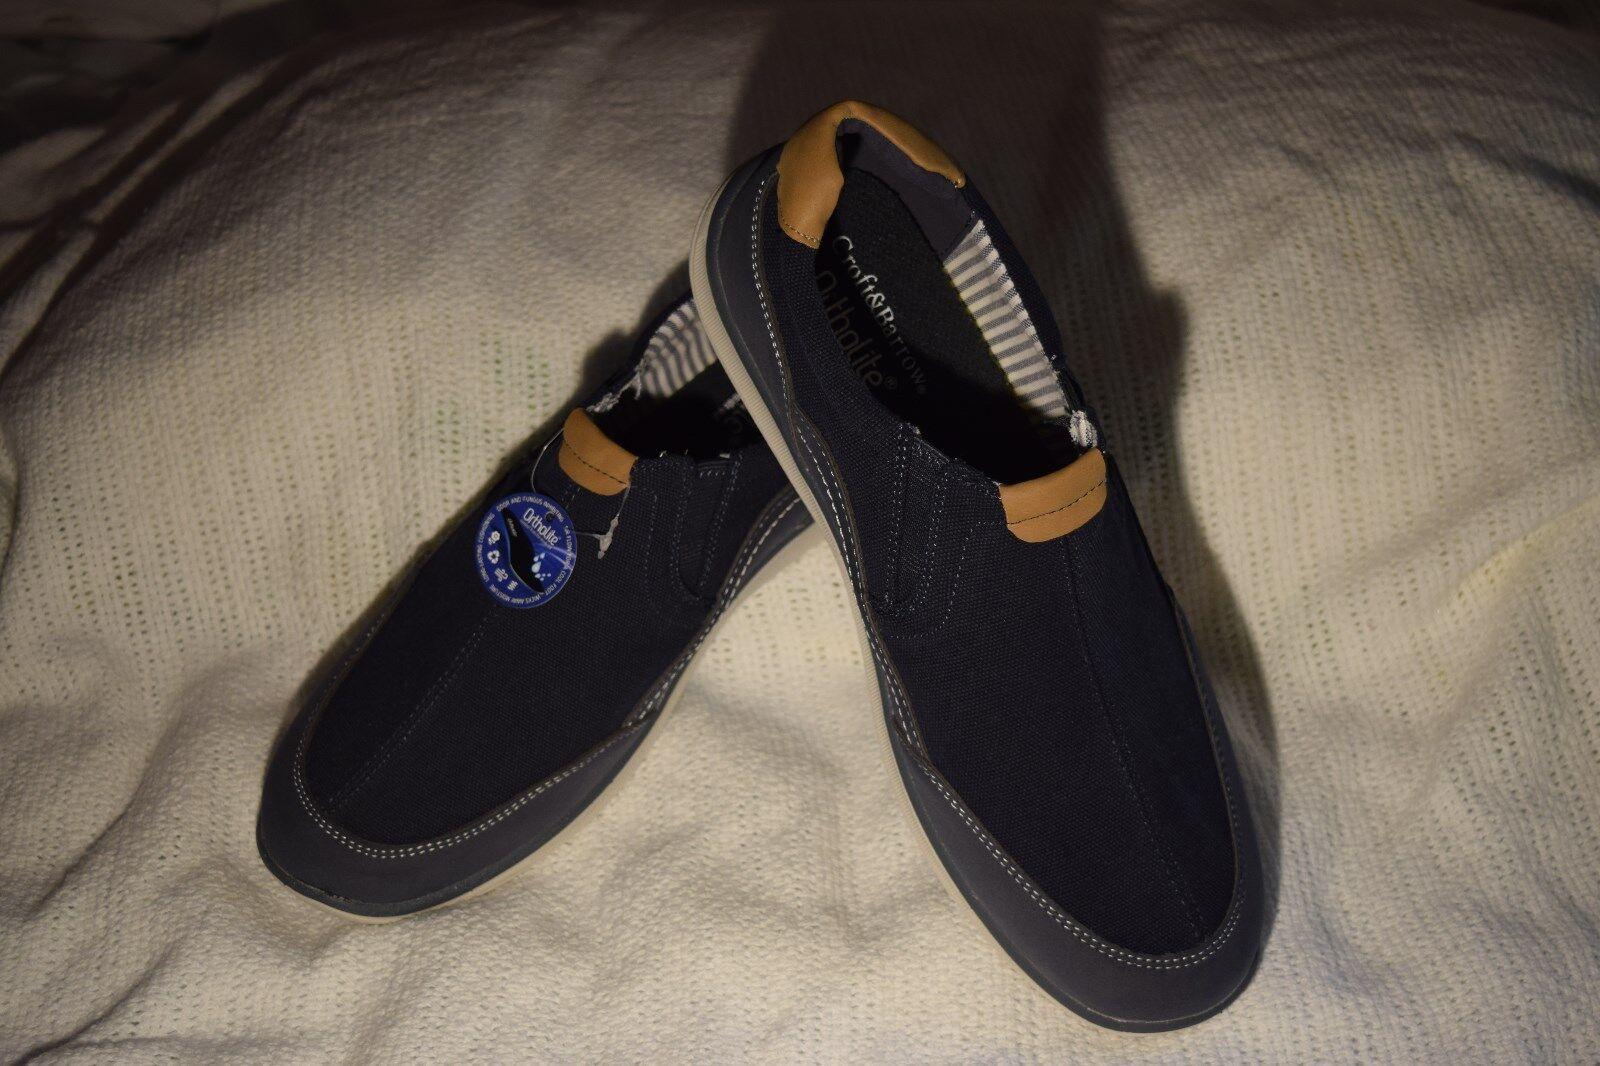 New Men's Size 11 Croft & Barrow Randy Ortholite Navy Loafer Slip on Boat shoes